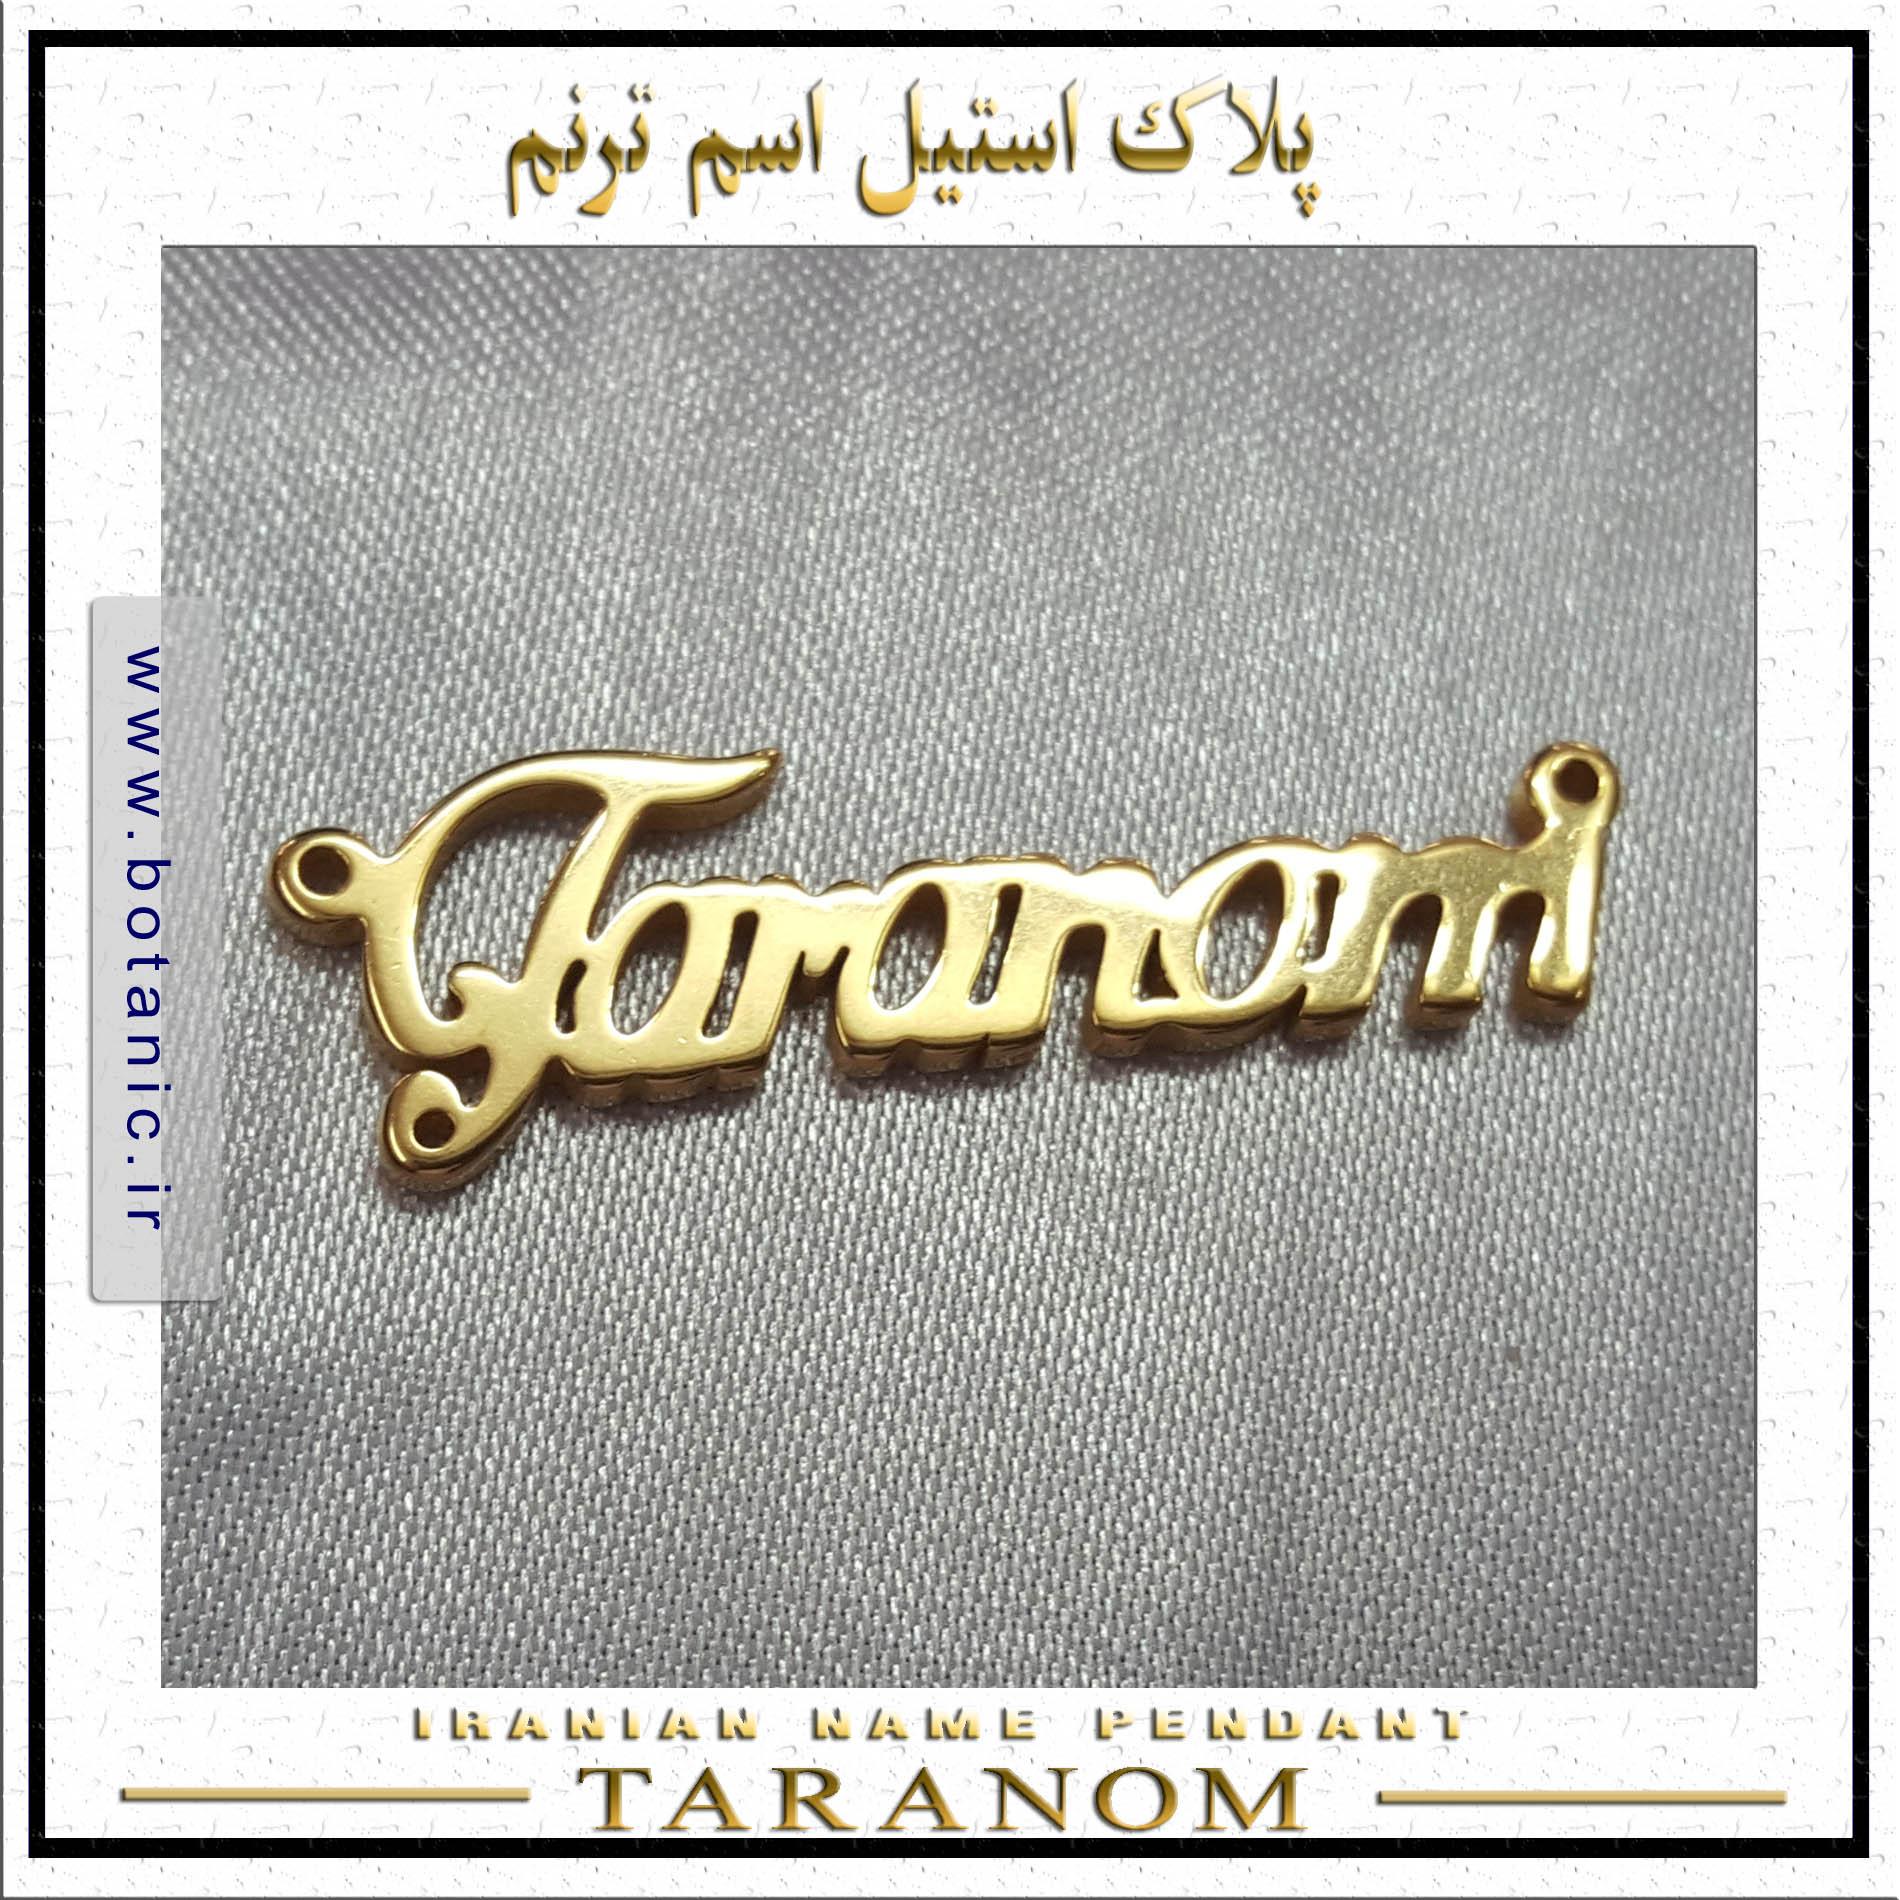 Iranian Name Pendant Taranom